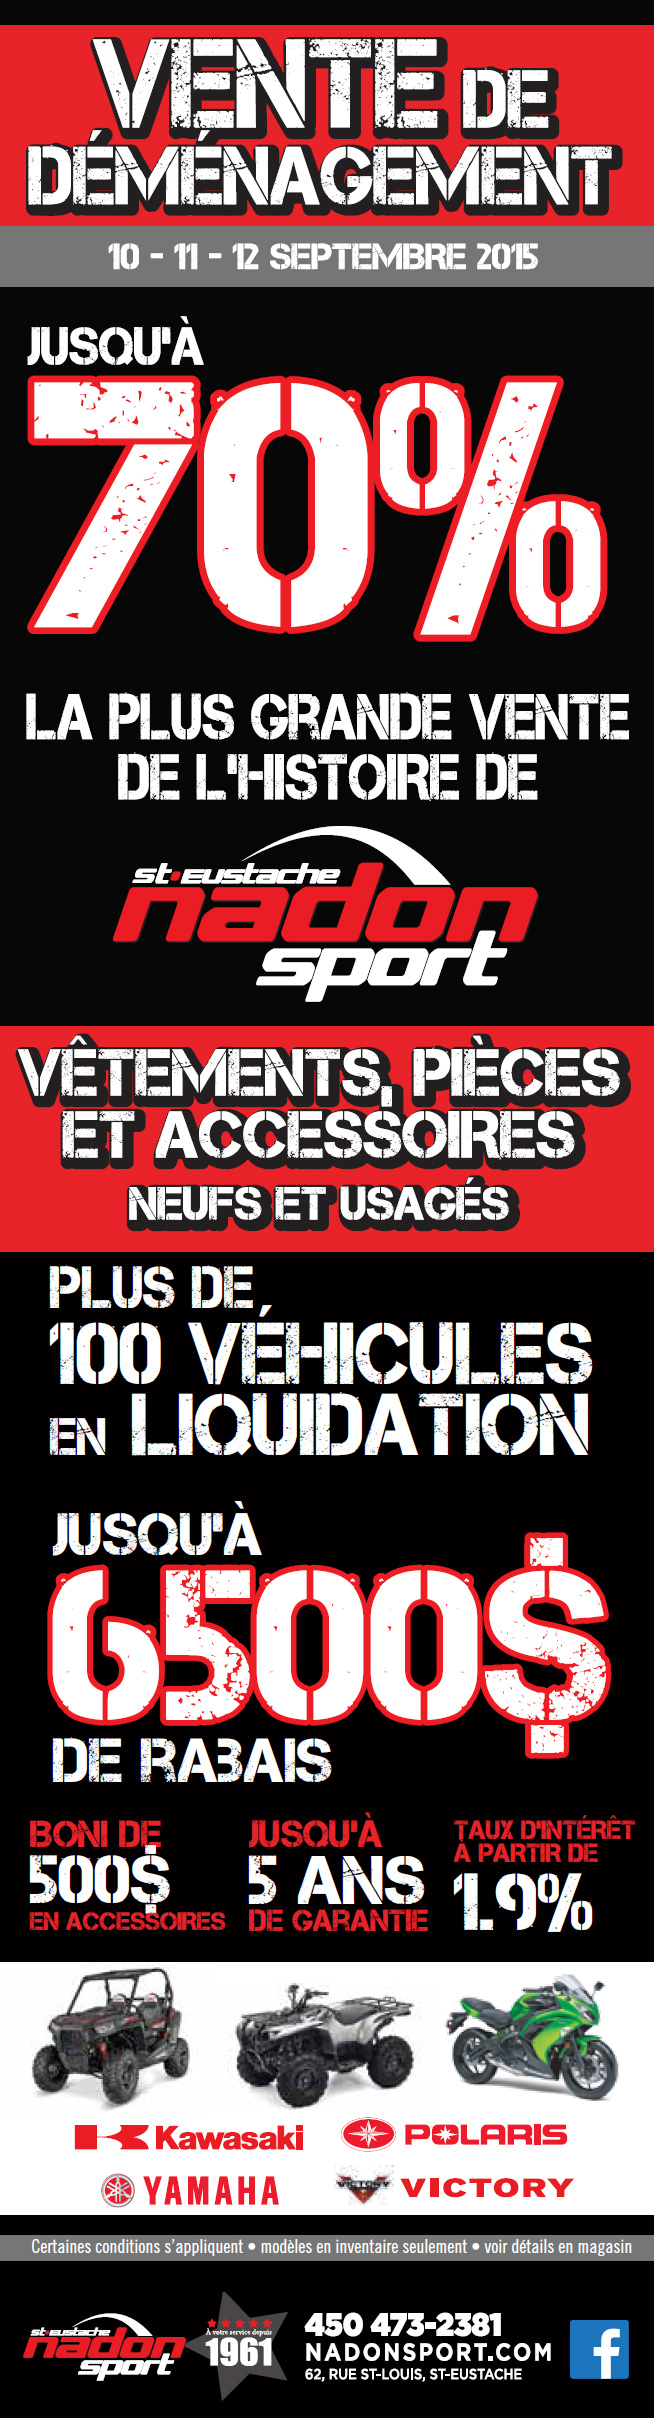 Nadon sport déménage a 8aff4ebe-e244-41d8-a93d-185d8b6e935c